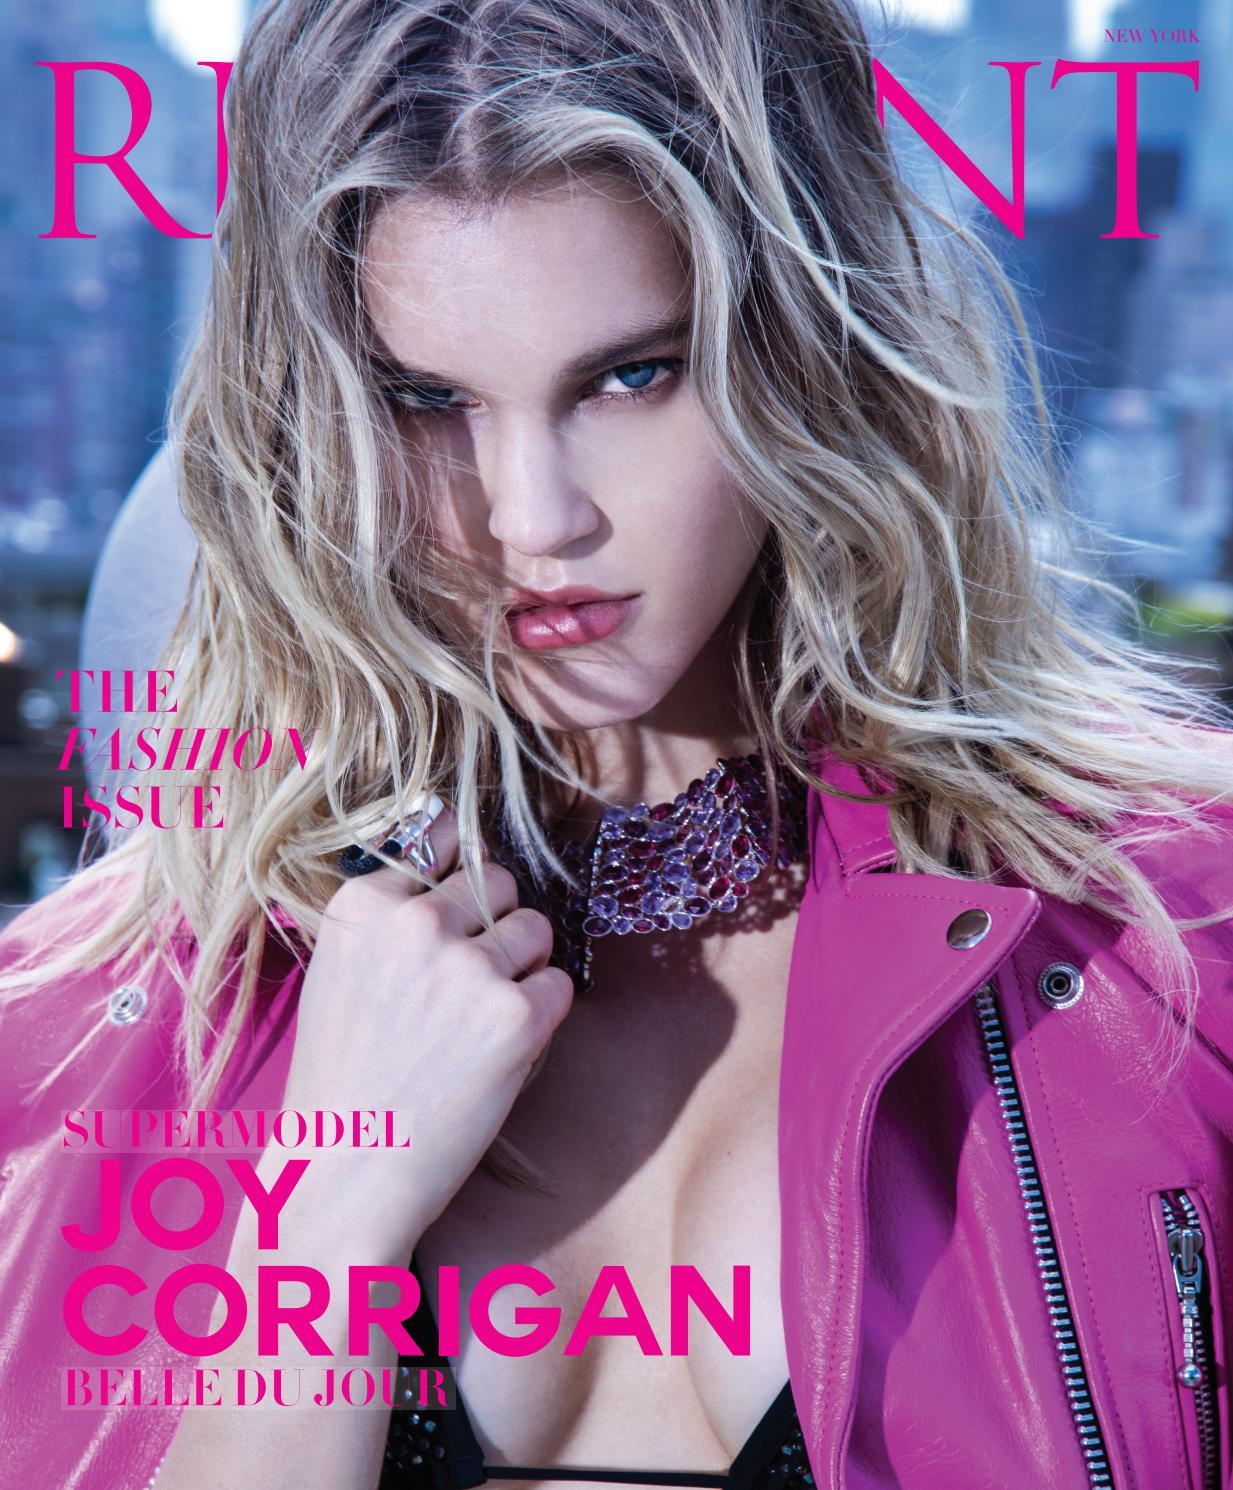 a00fbe9a9f3351 Resident Magazine NY OCTOBER 2018 JOY CORRIGAN by Resident Magazine - issuu